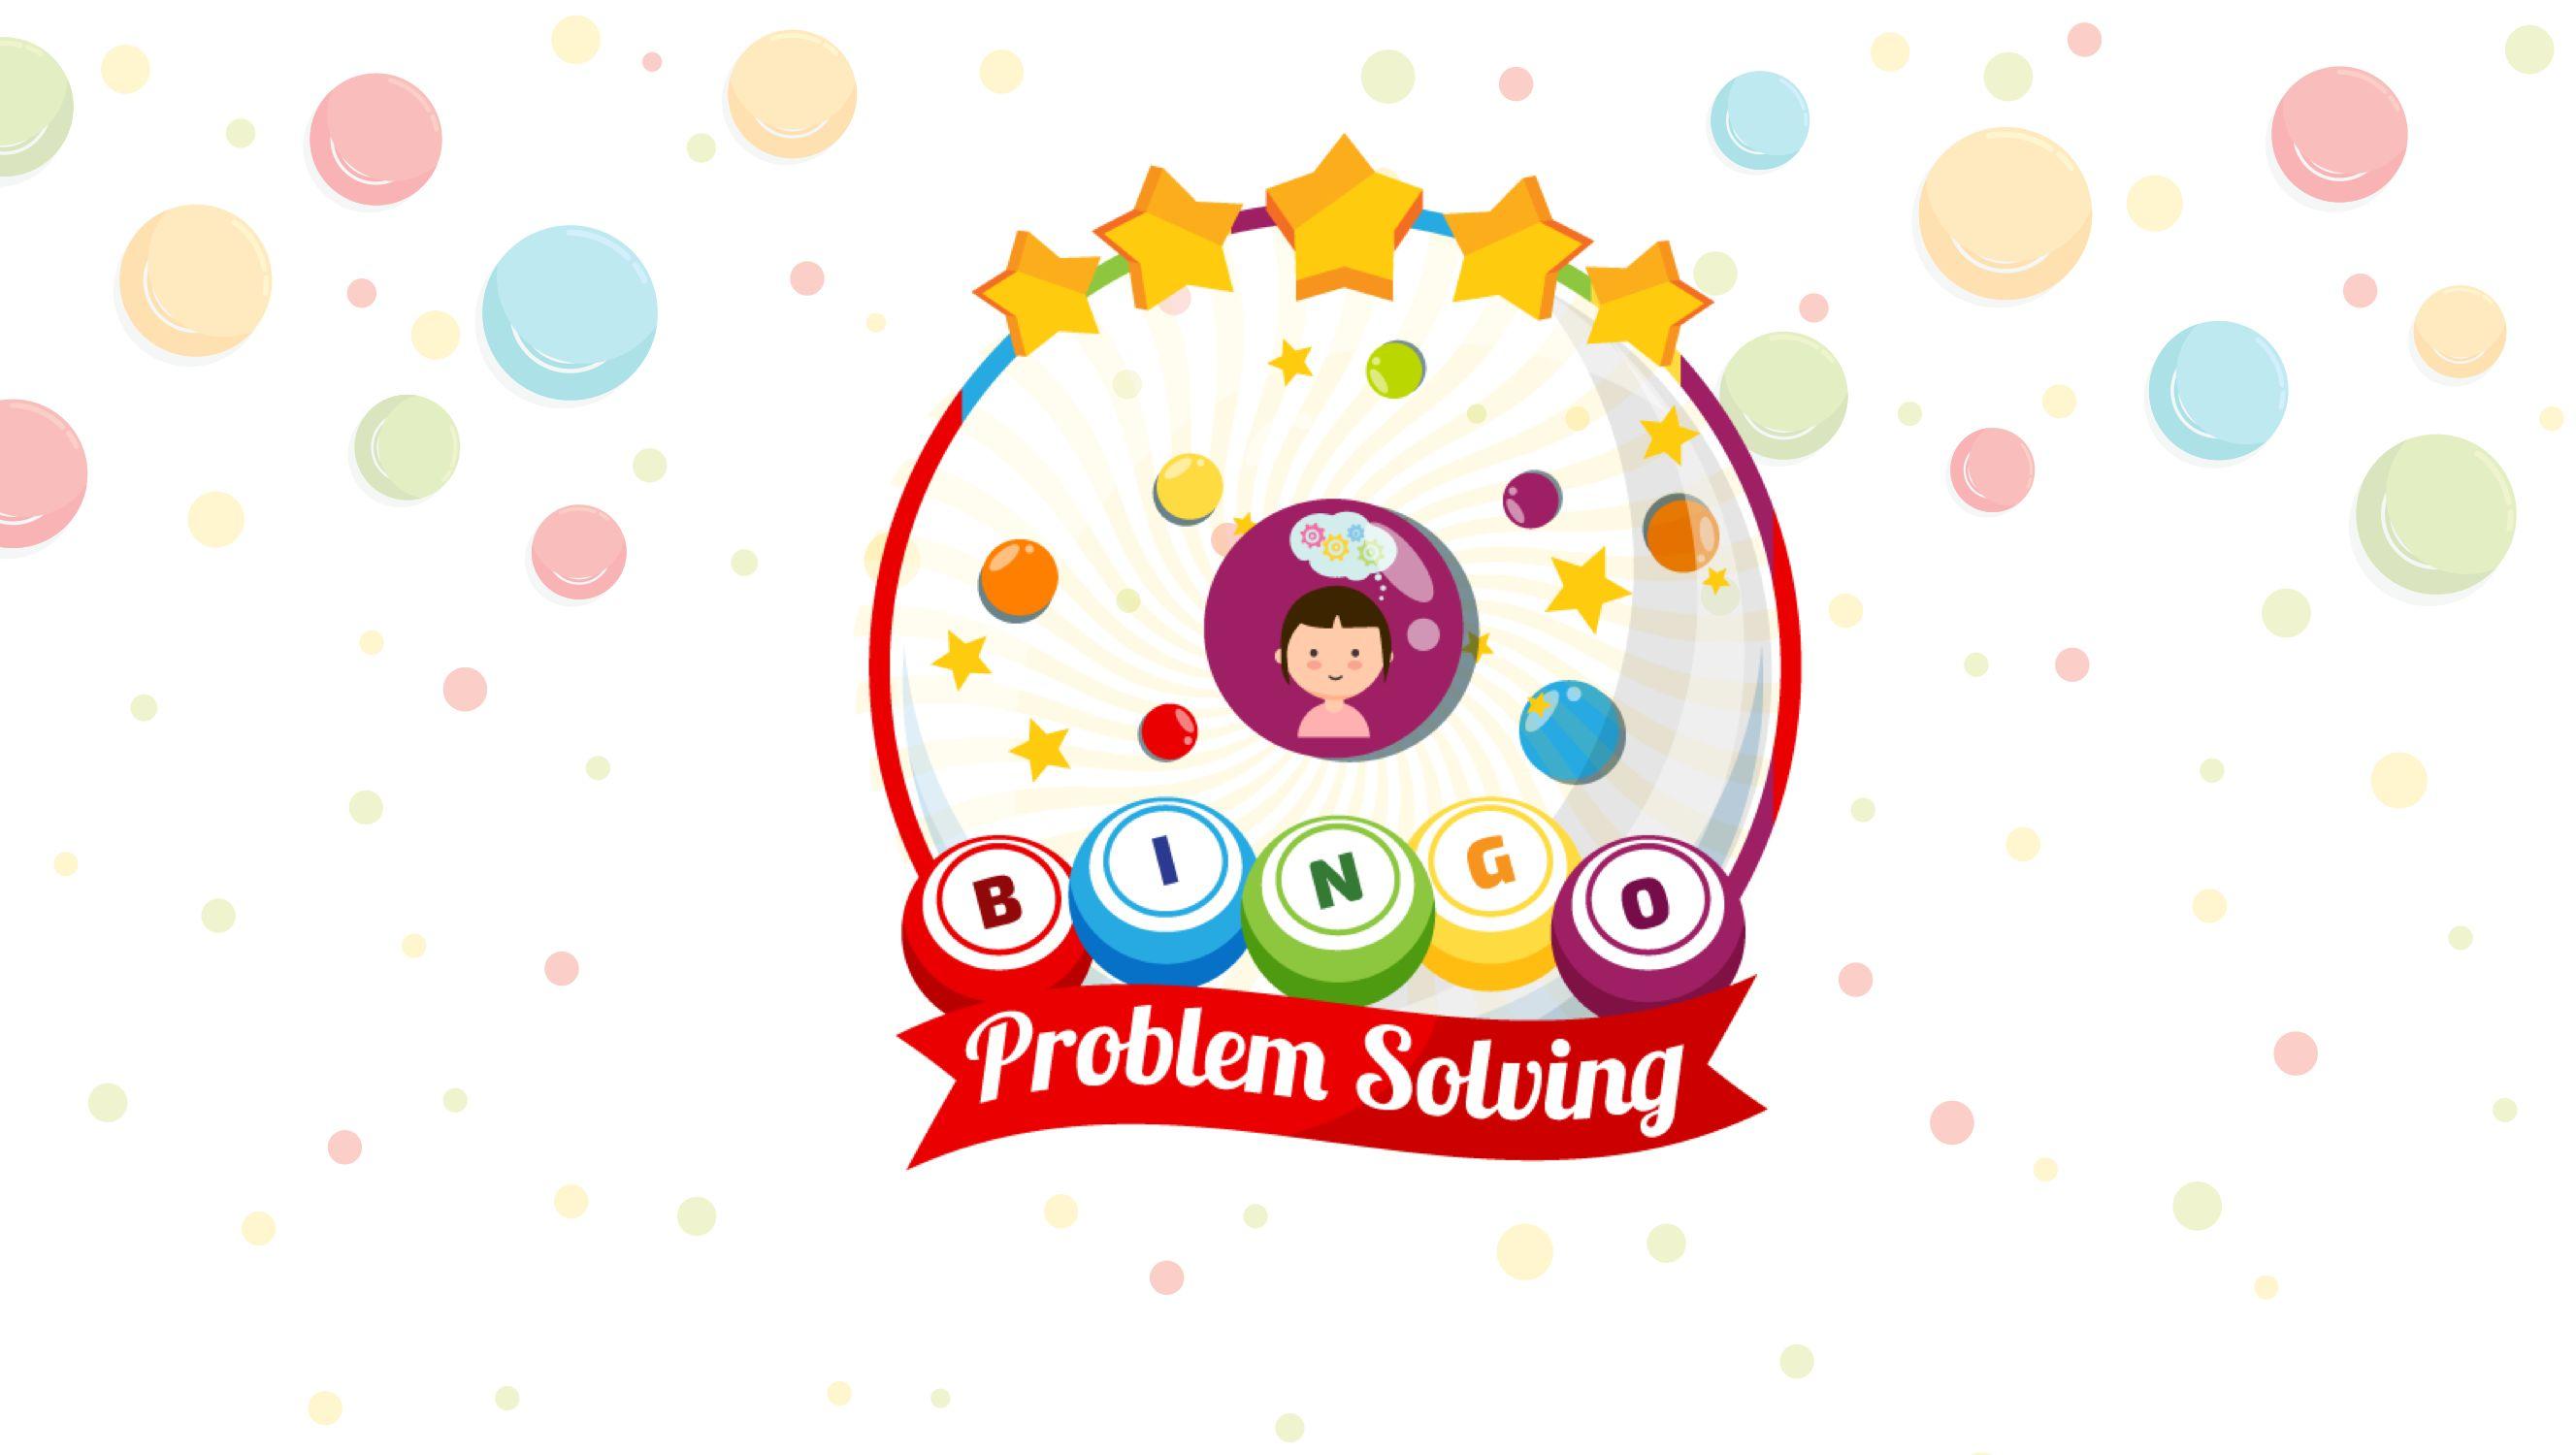 Bingo: Problem Solving